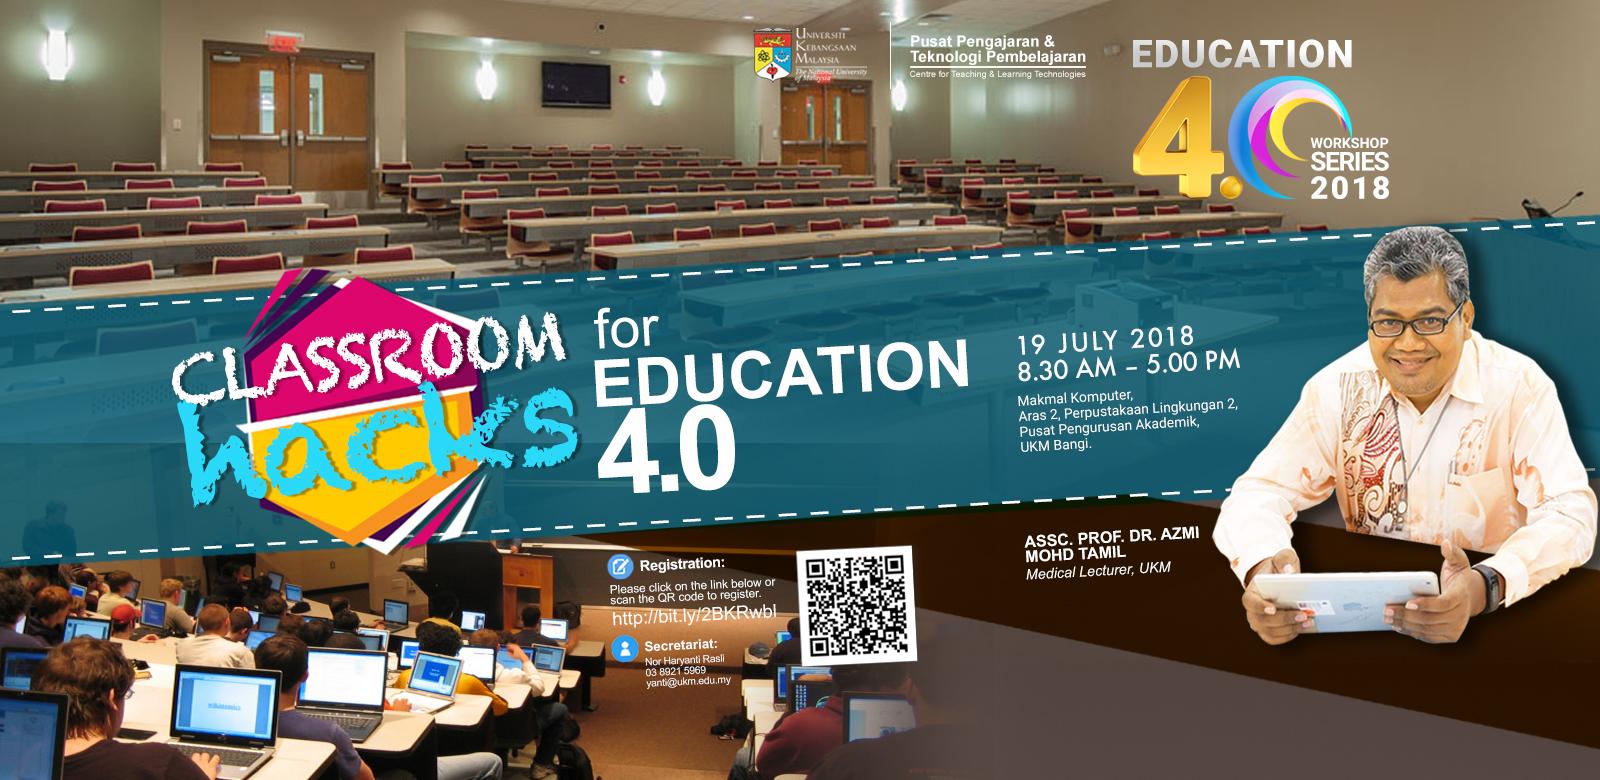 CLASSROOM HACKS for education 4.0